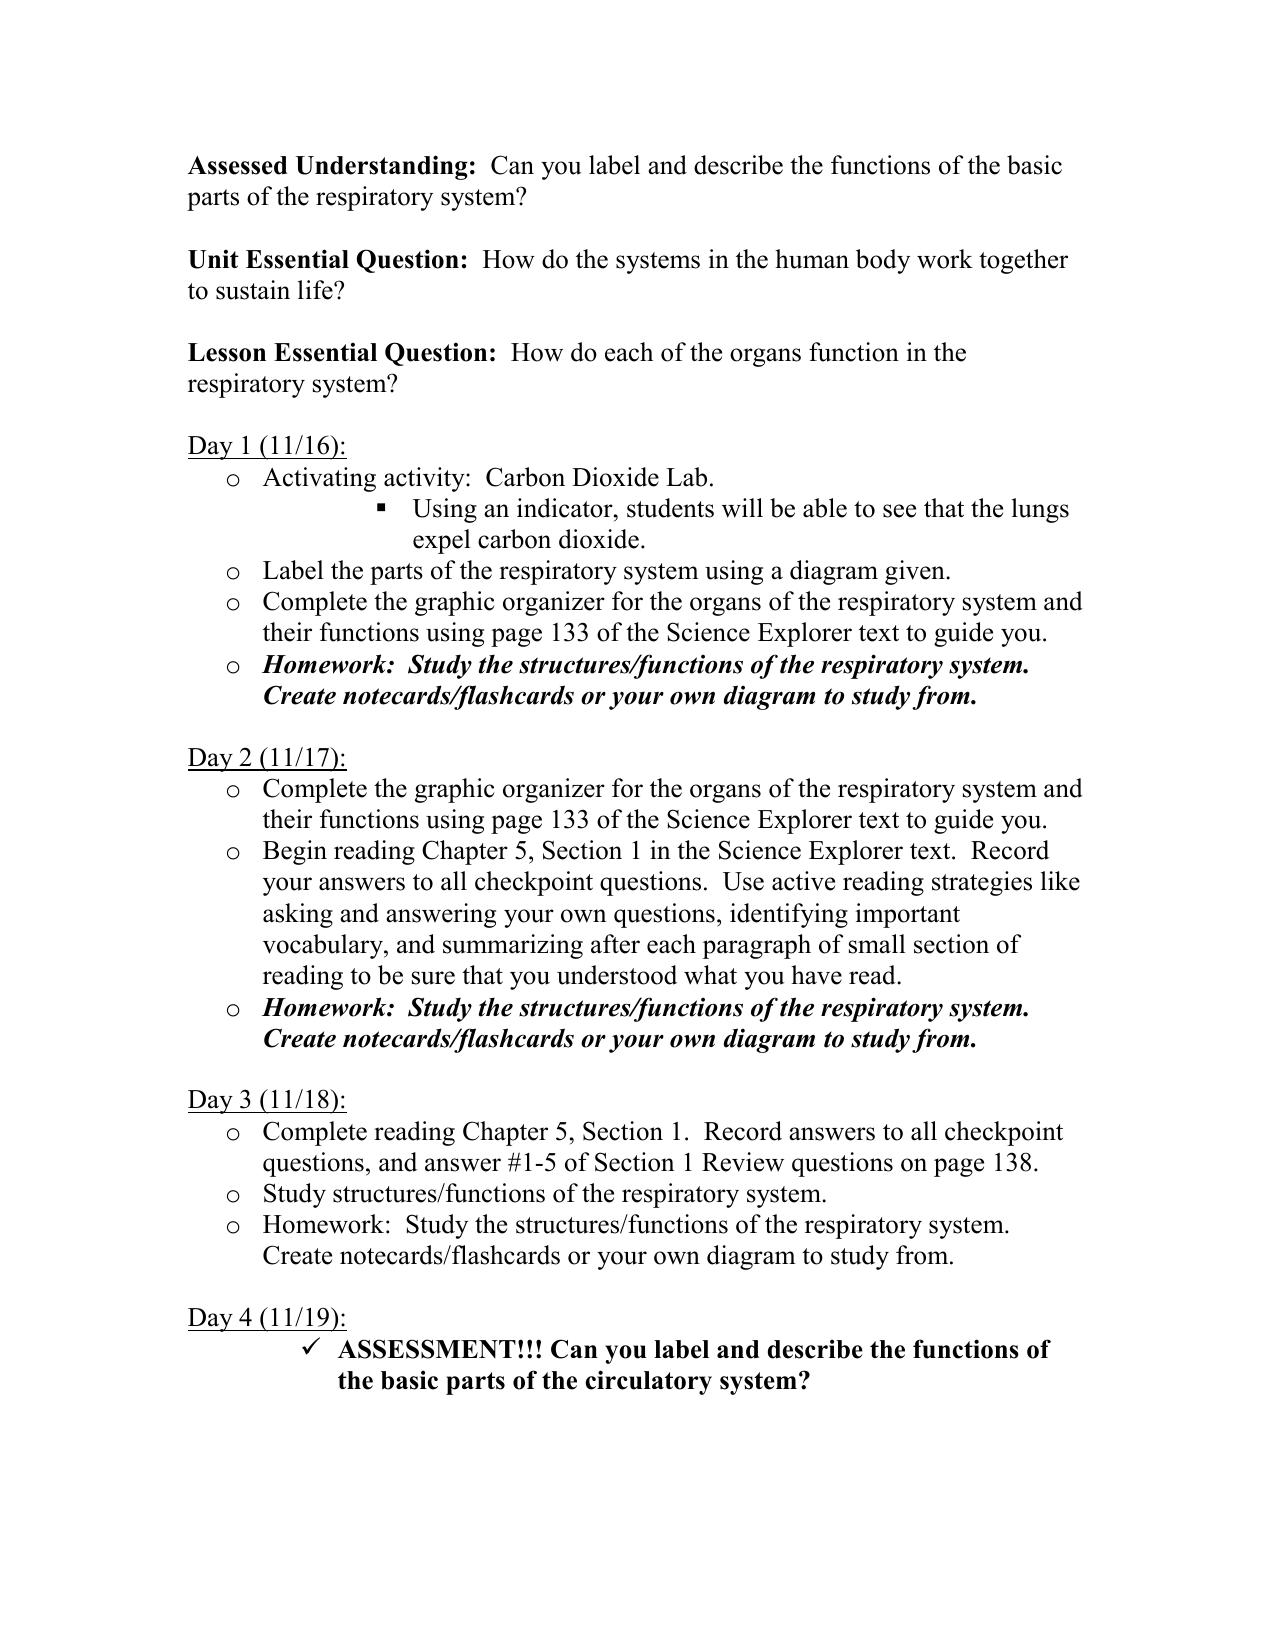 Respiratory System Lesson Agenda